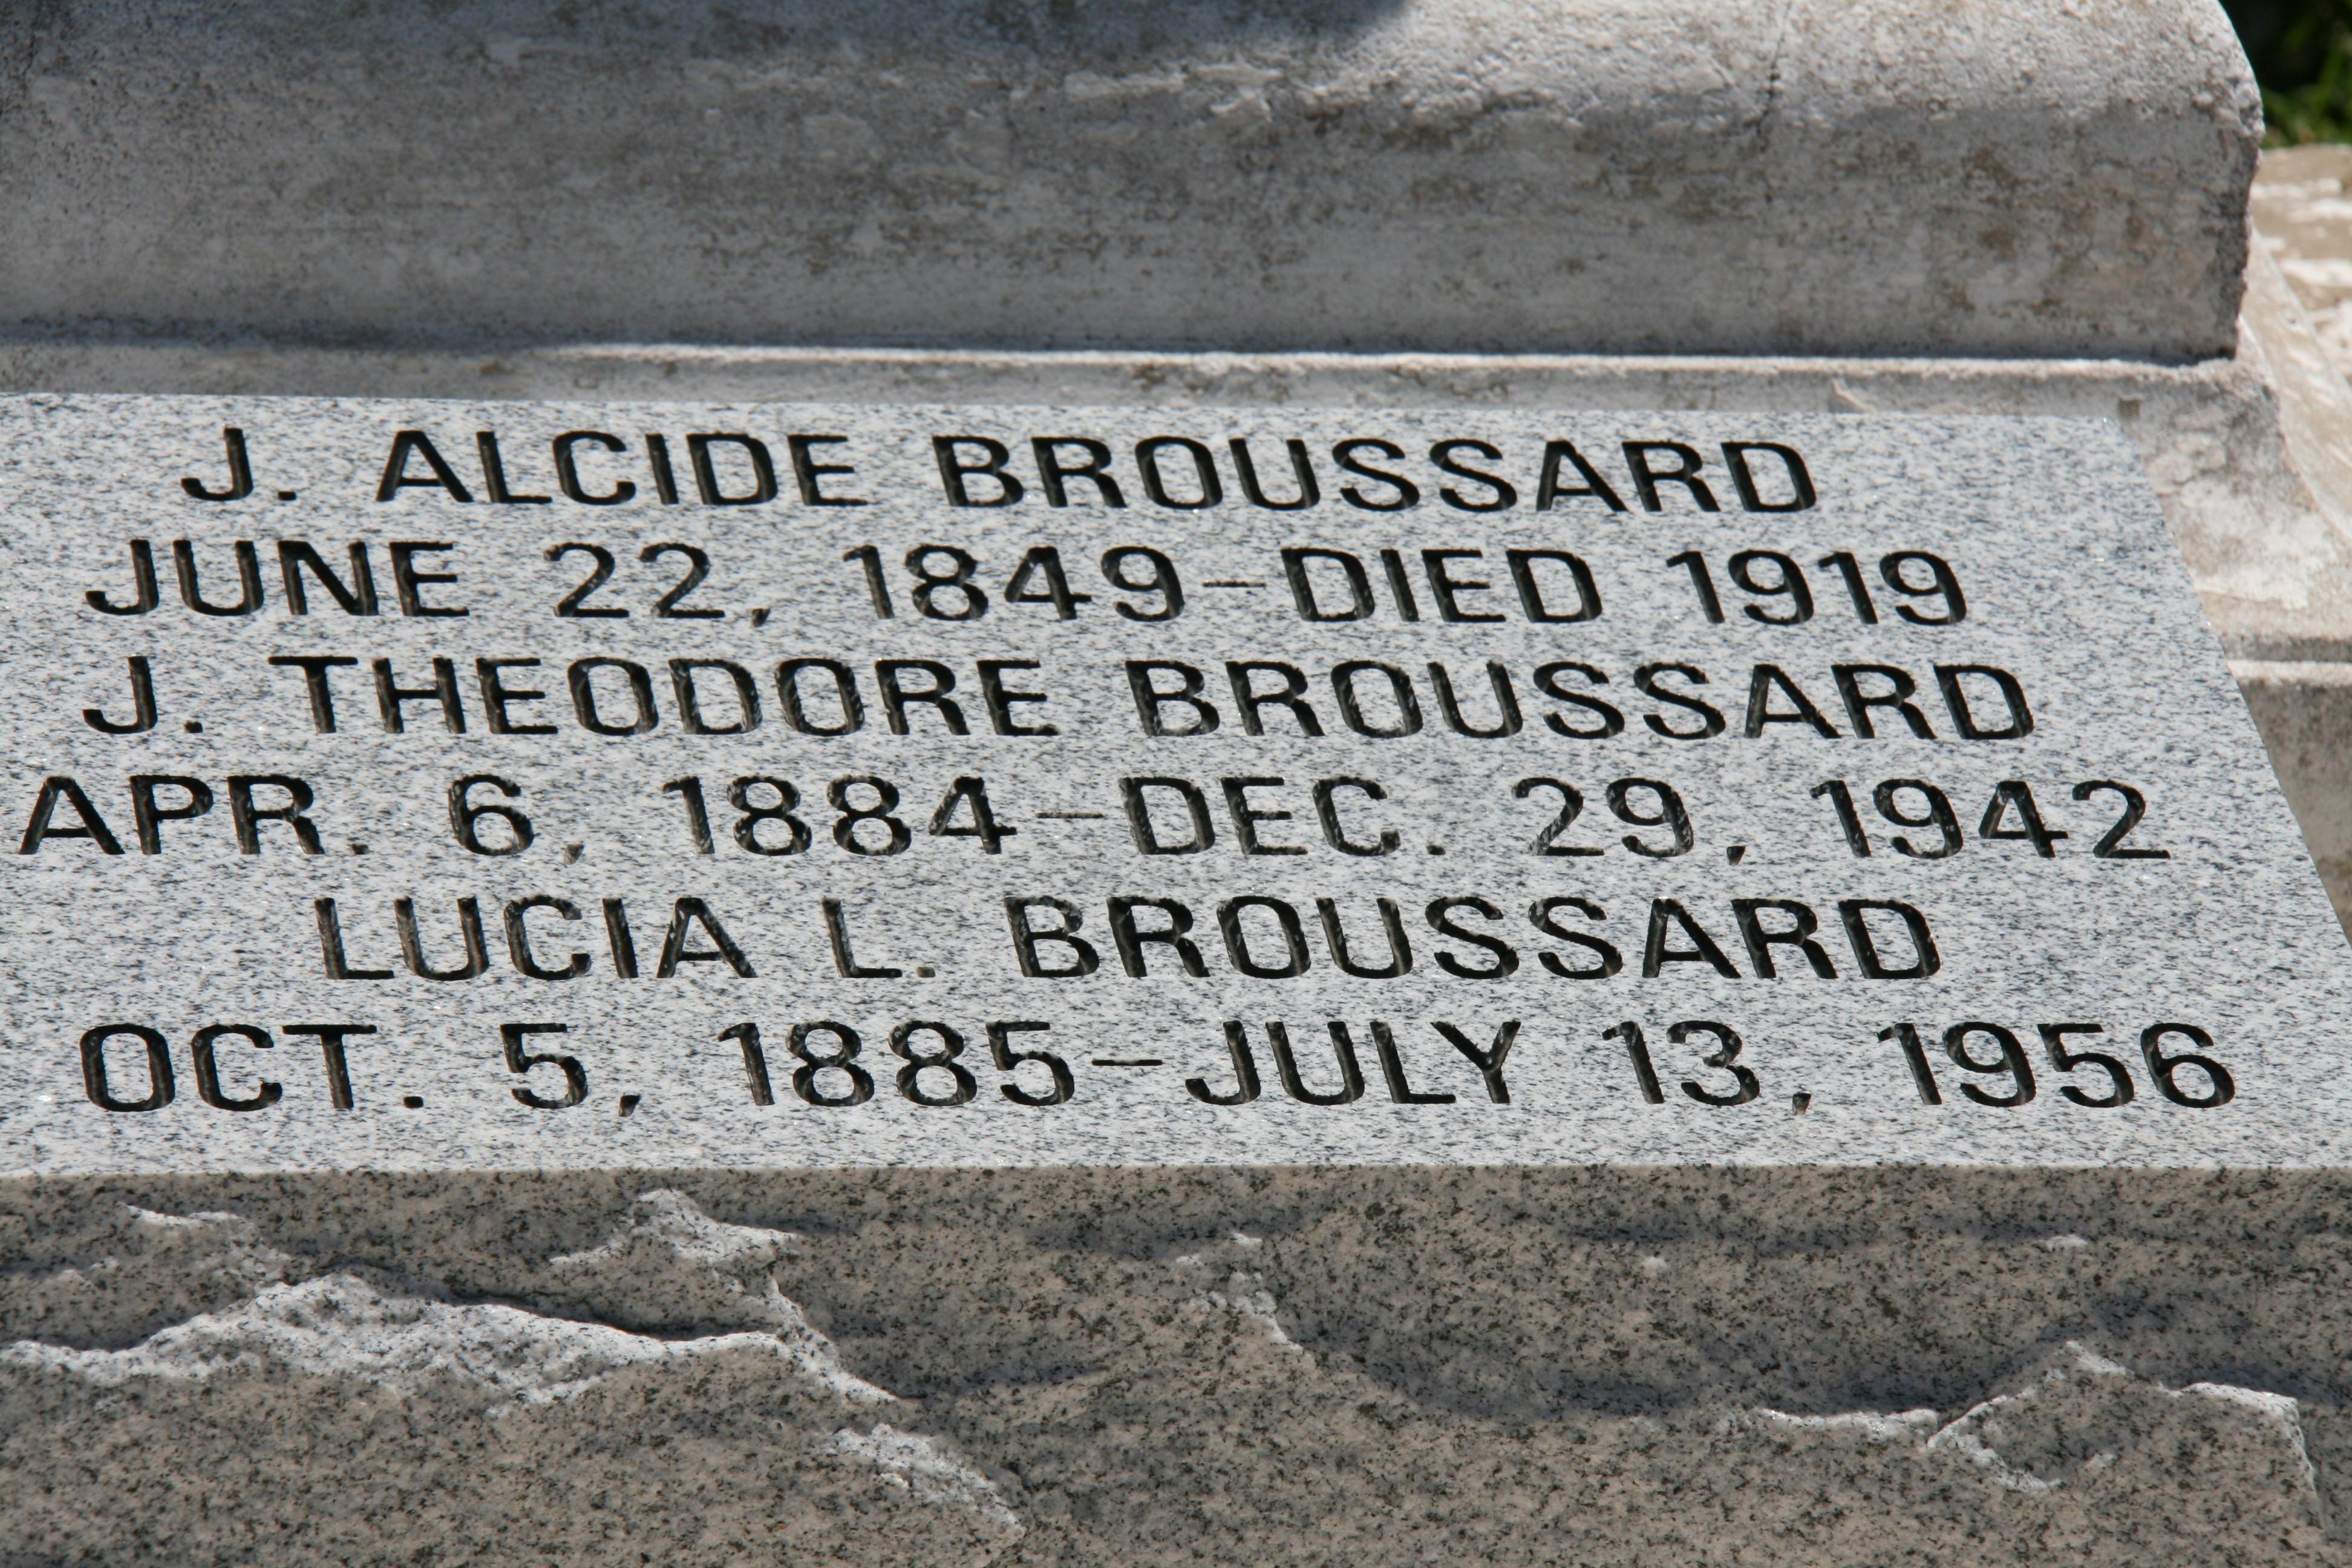 Joseph Alcide Broussard